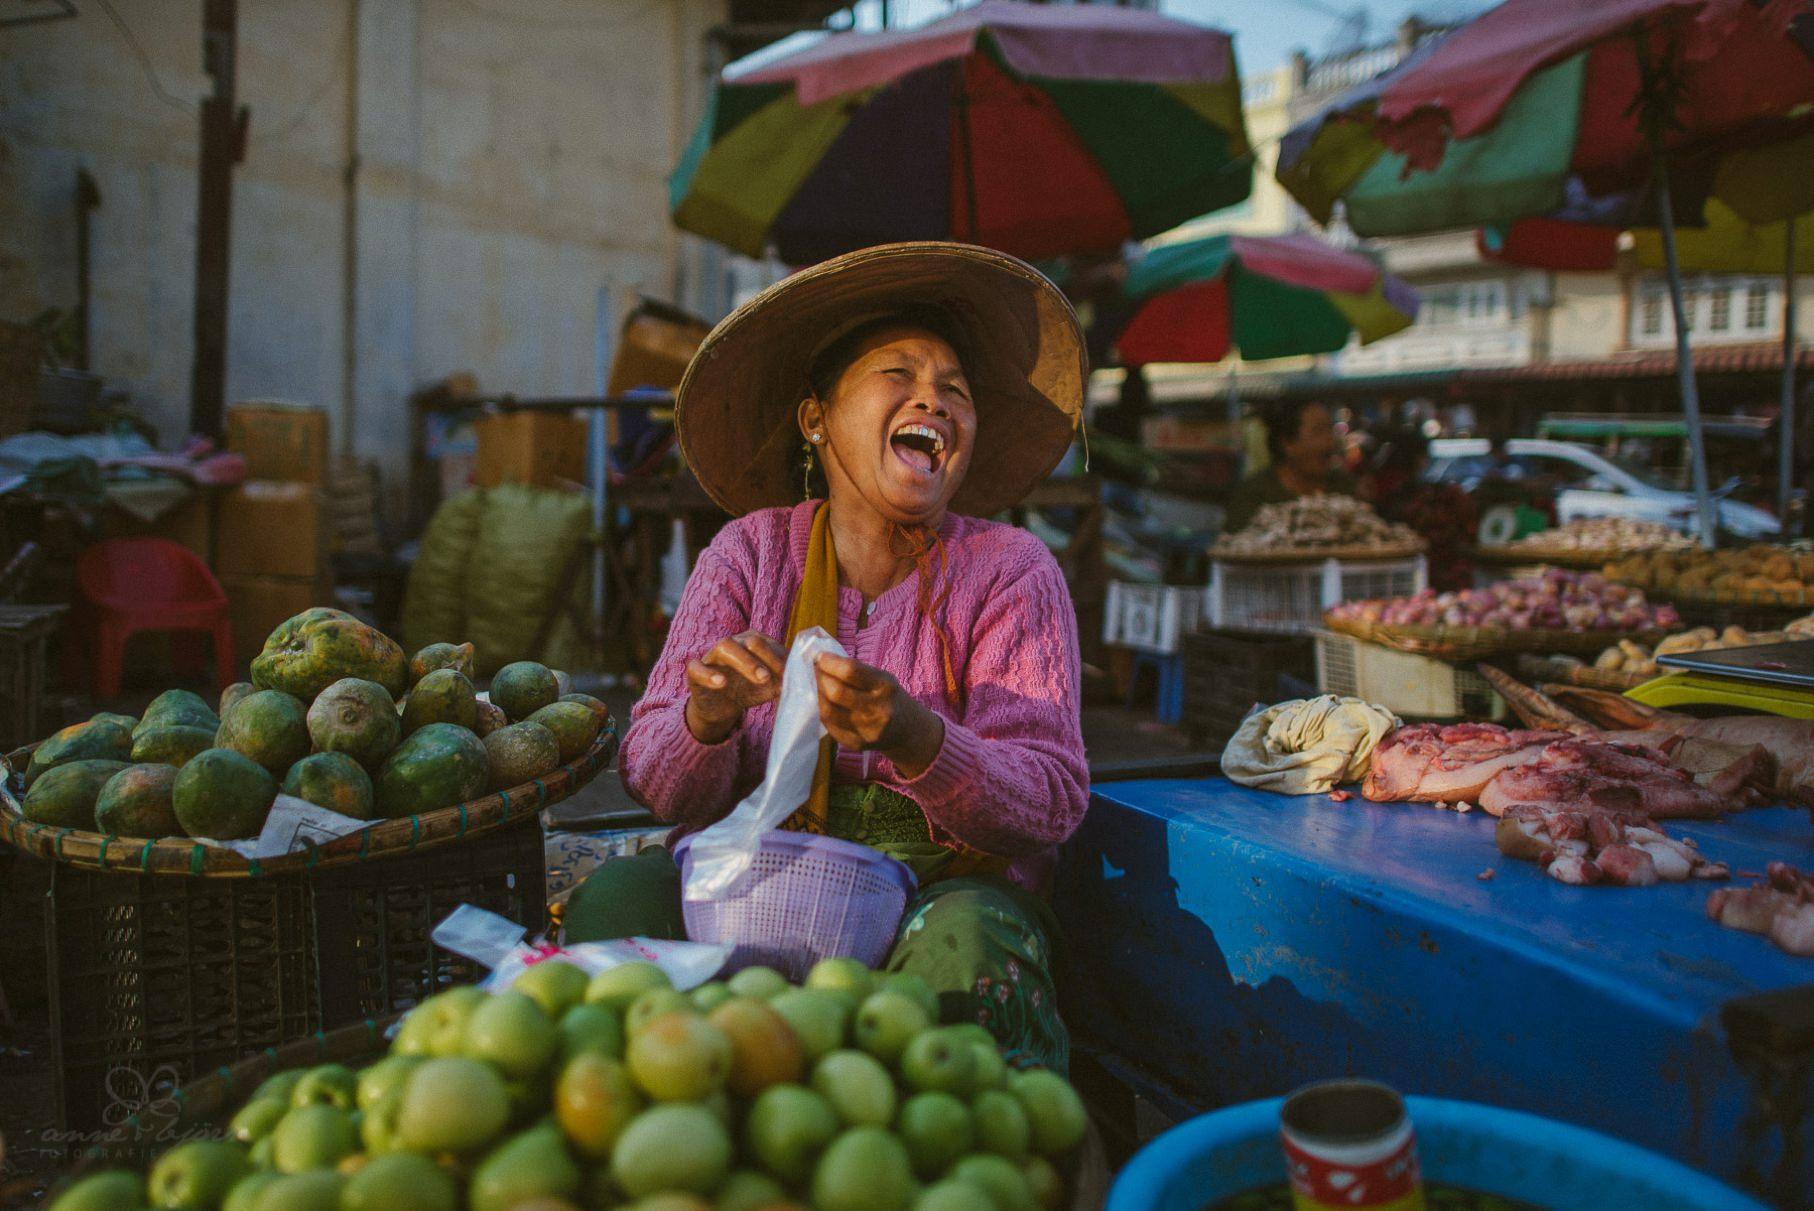 0069 yangon mandalay d76 7223 - Großstädte Myanmars - Yangon & Mandalay